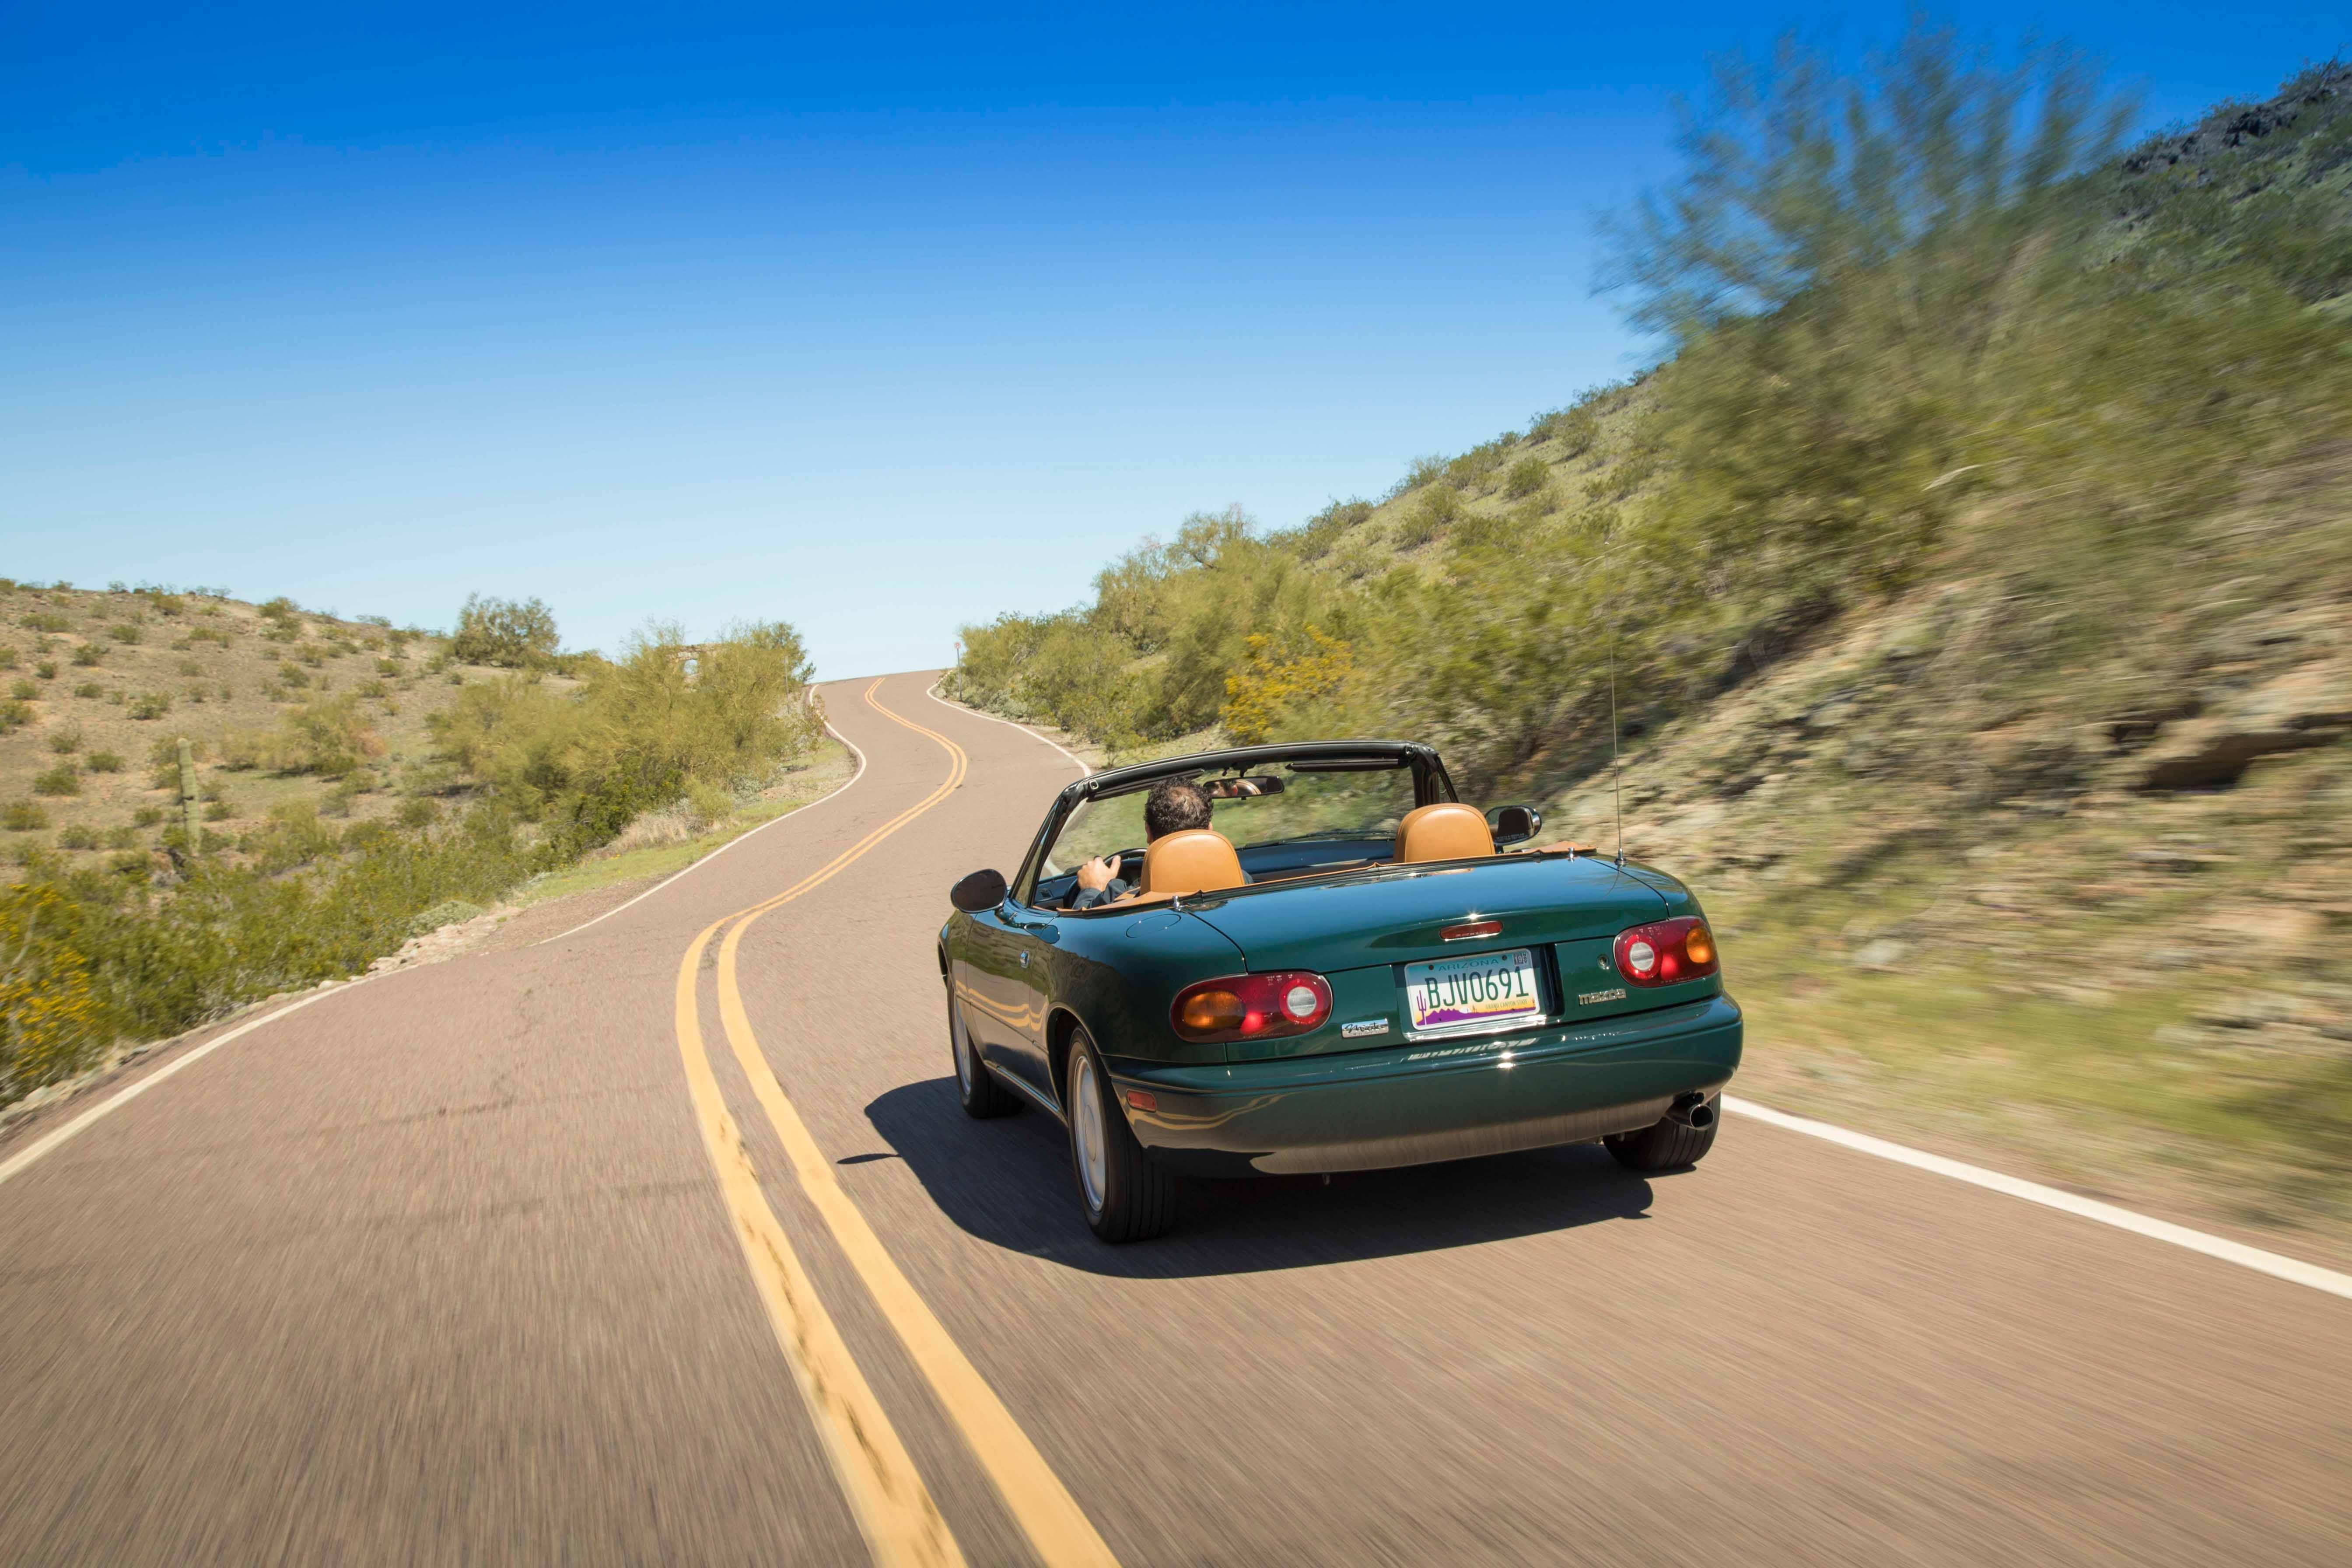 1990 Mazda MX-5 Miata green desert rear